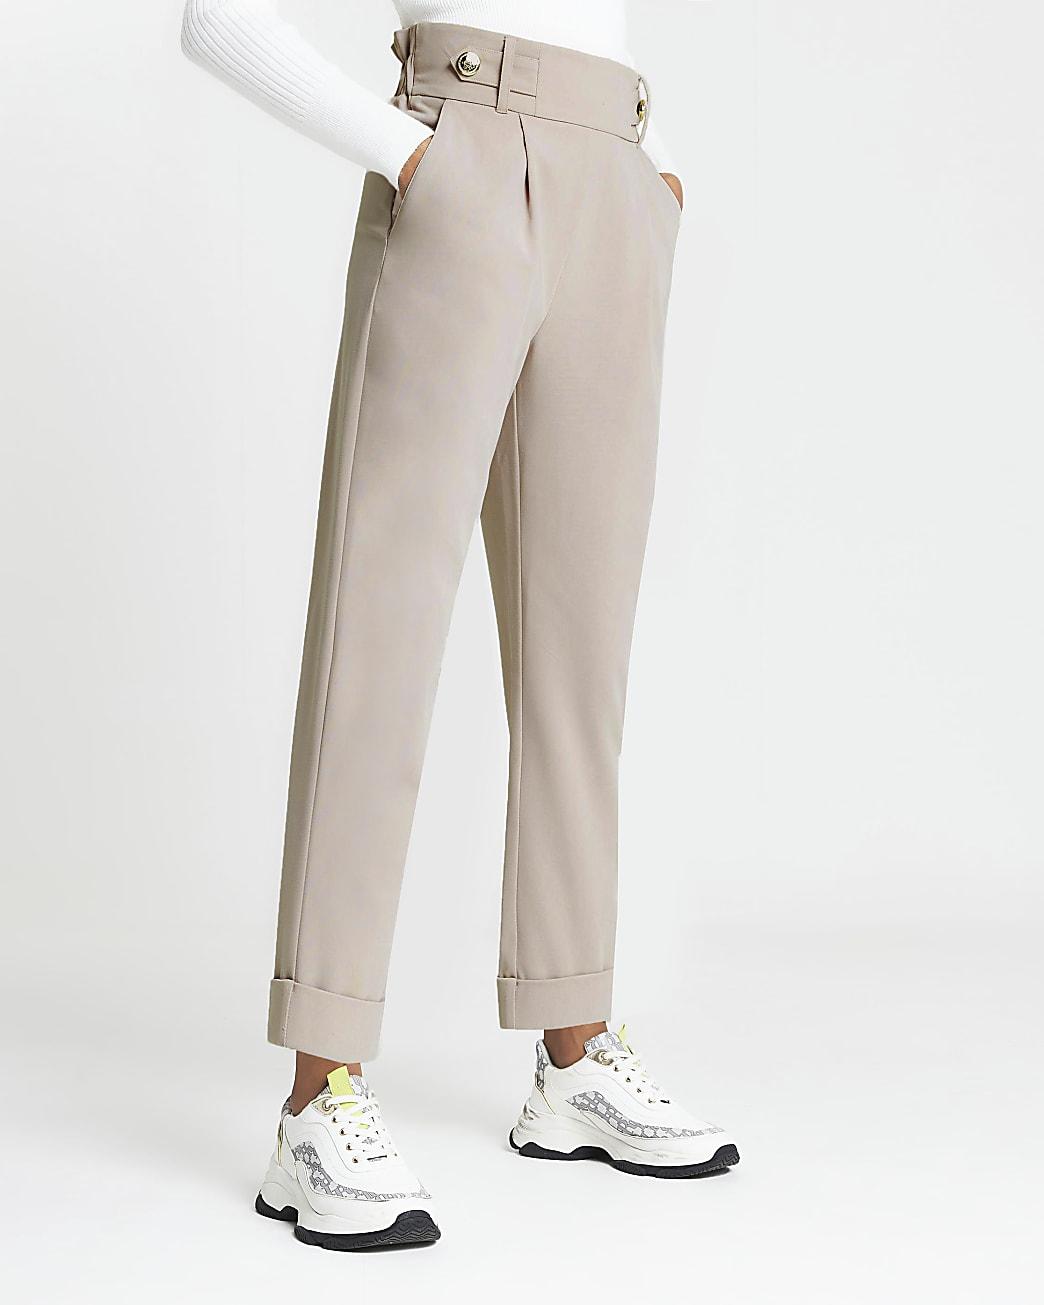 Beige pleated peg leg trousers